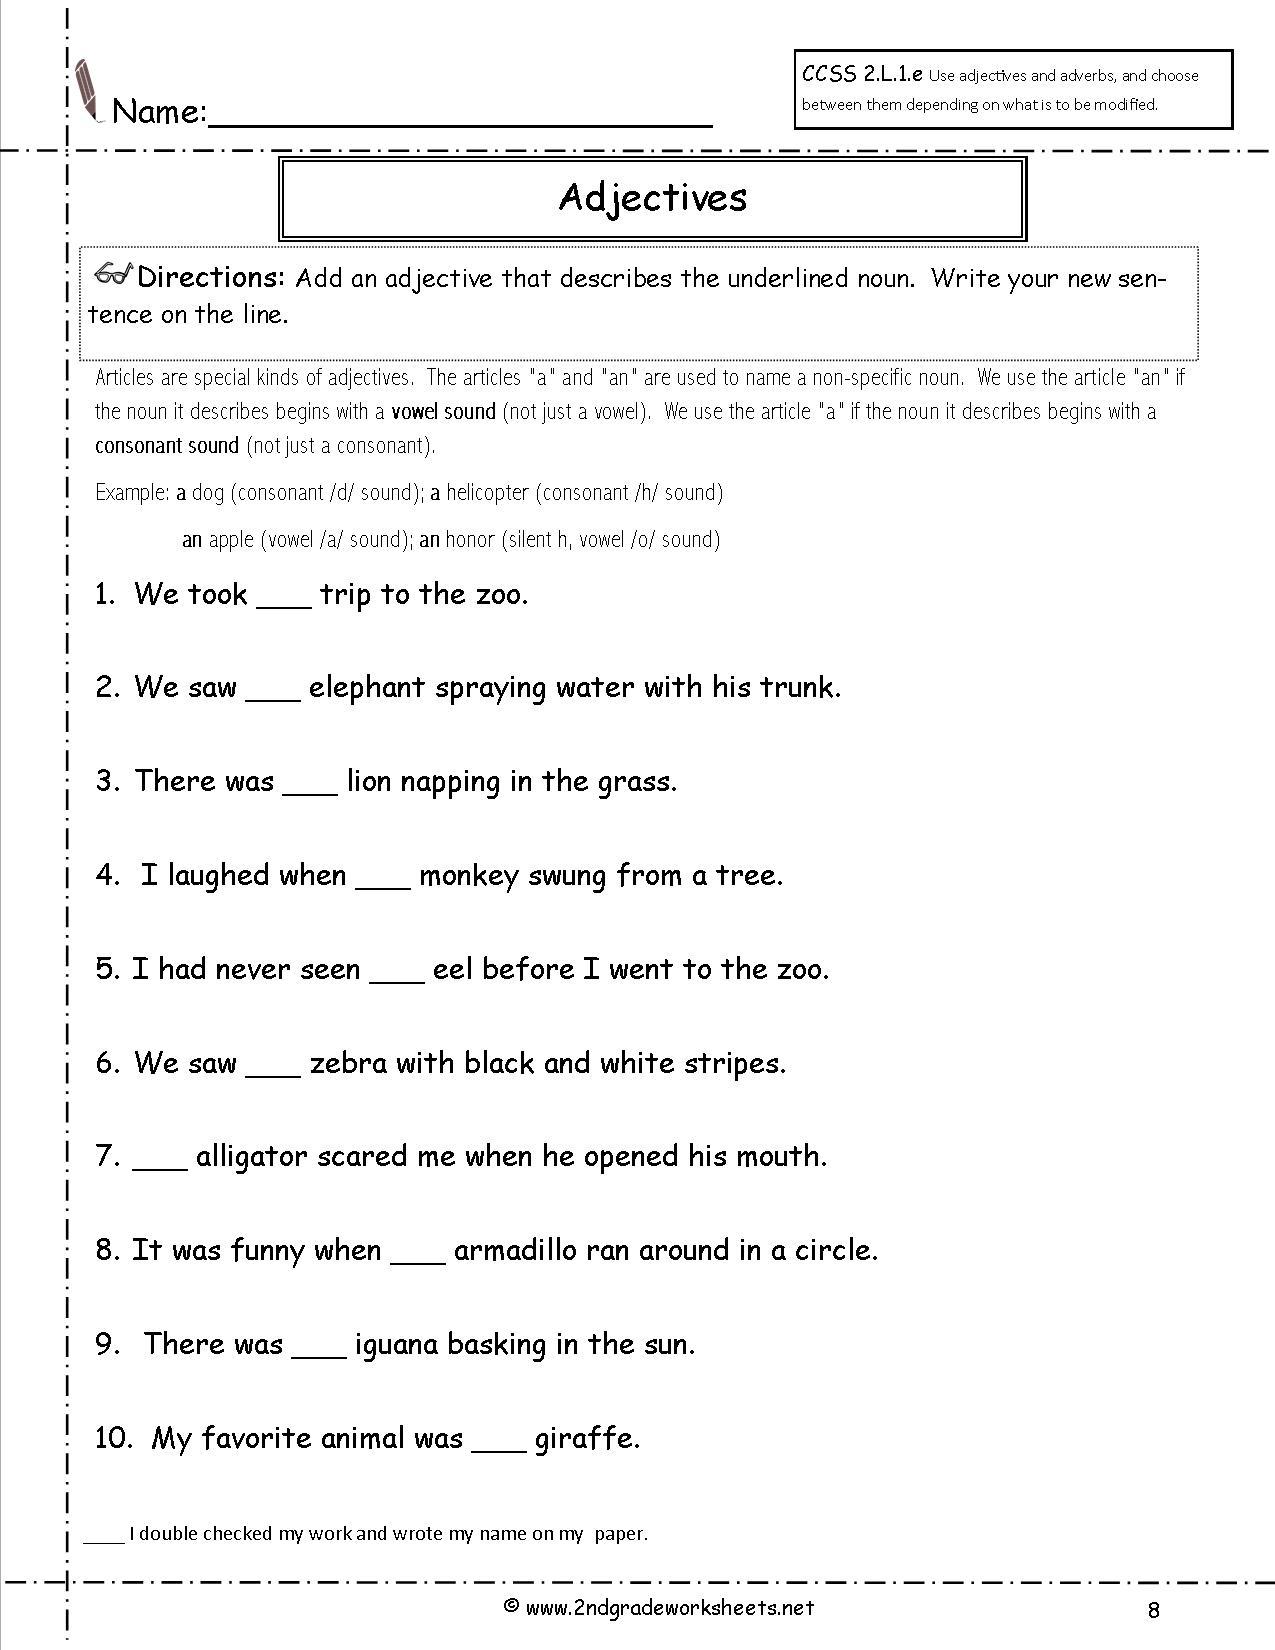 Free Language/grammar Worksheets And Printouts | Printable English Worksheets